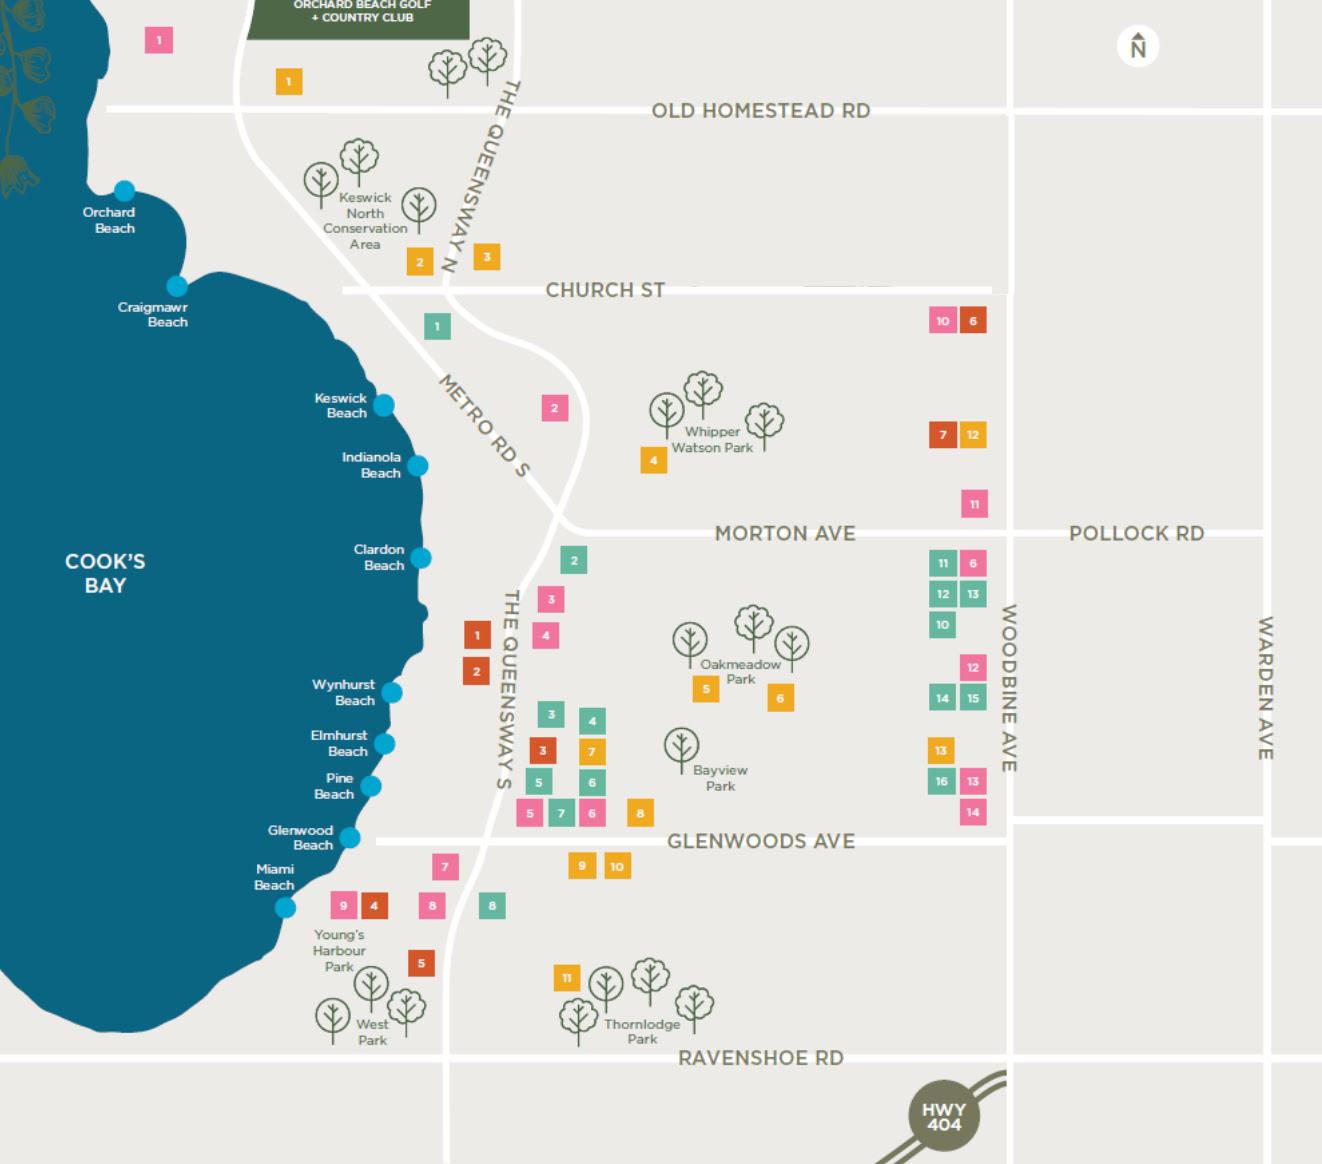 Simcoe Landing Keswick:New Release of 45Ft Detached With From $900K独立屋价格&户型图– 51新楼花新房专家置业网